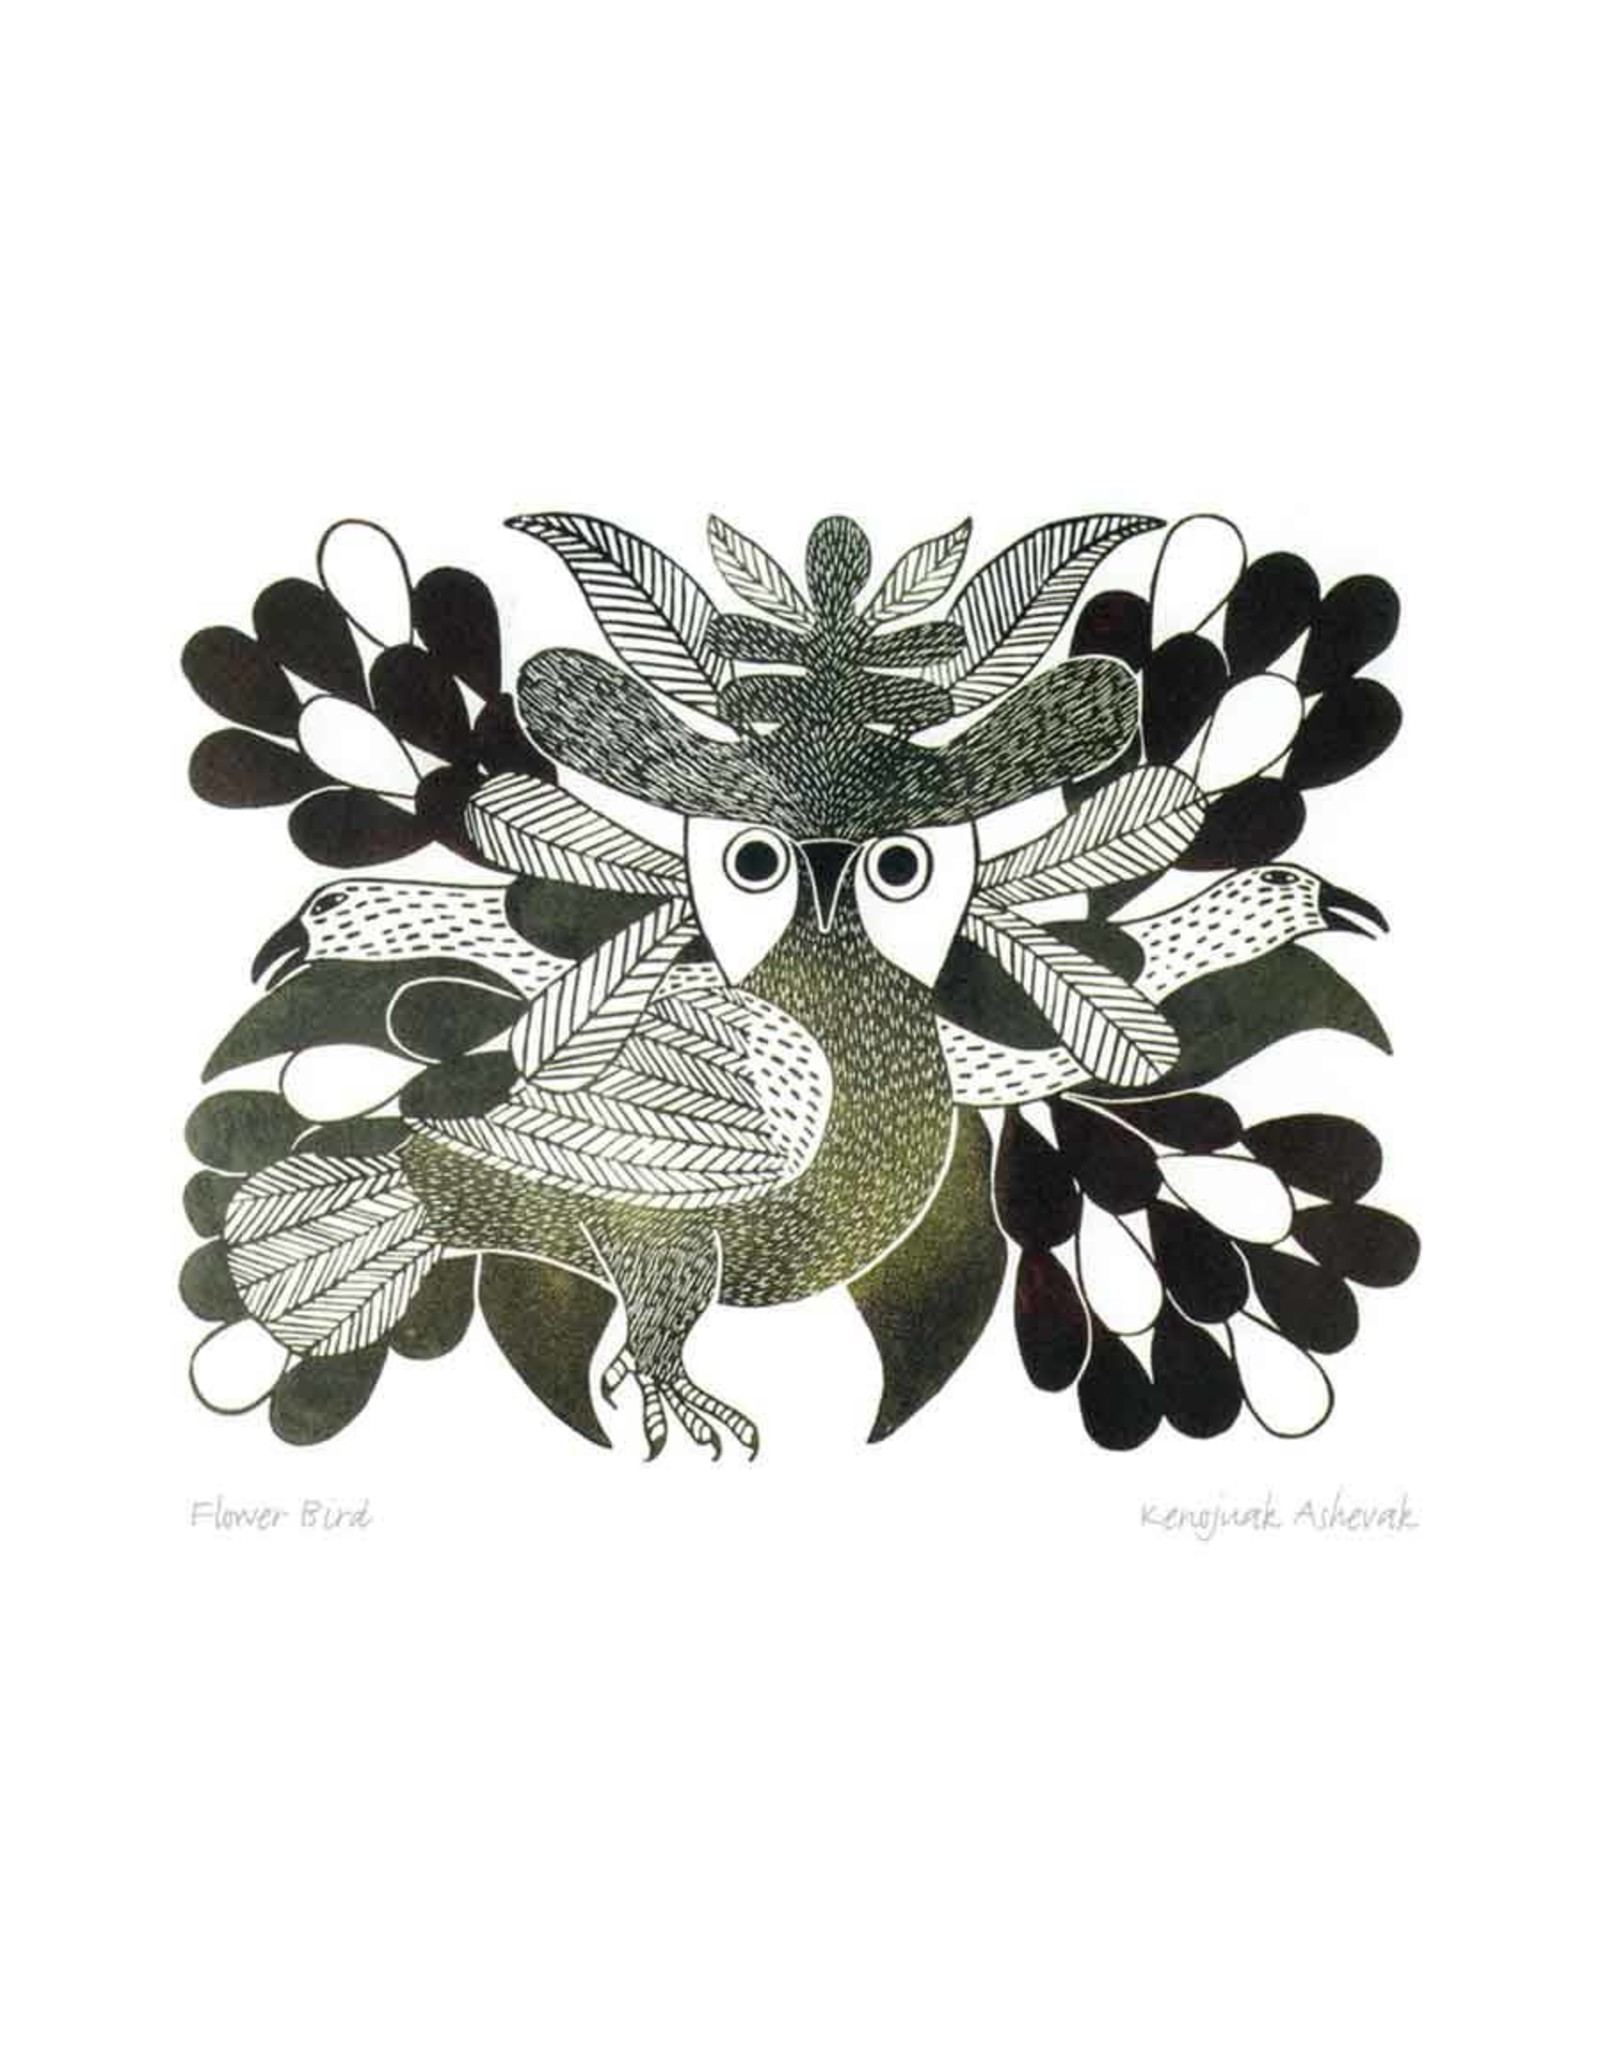 Flower Bird by Kenojuak Ashevak Matted